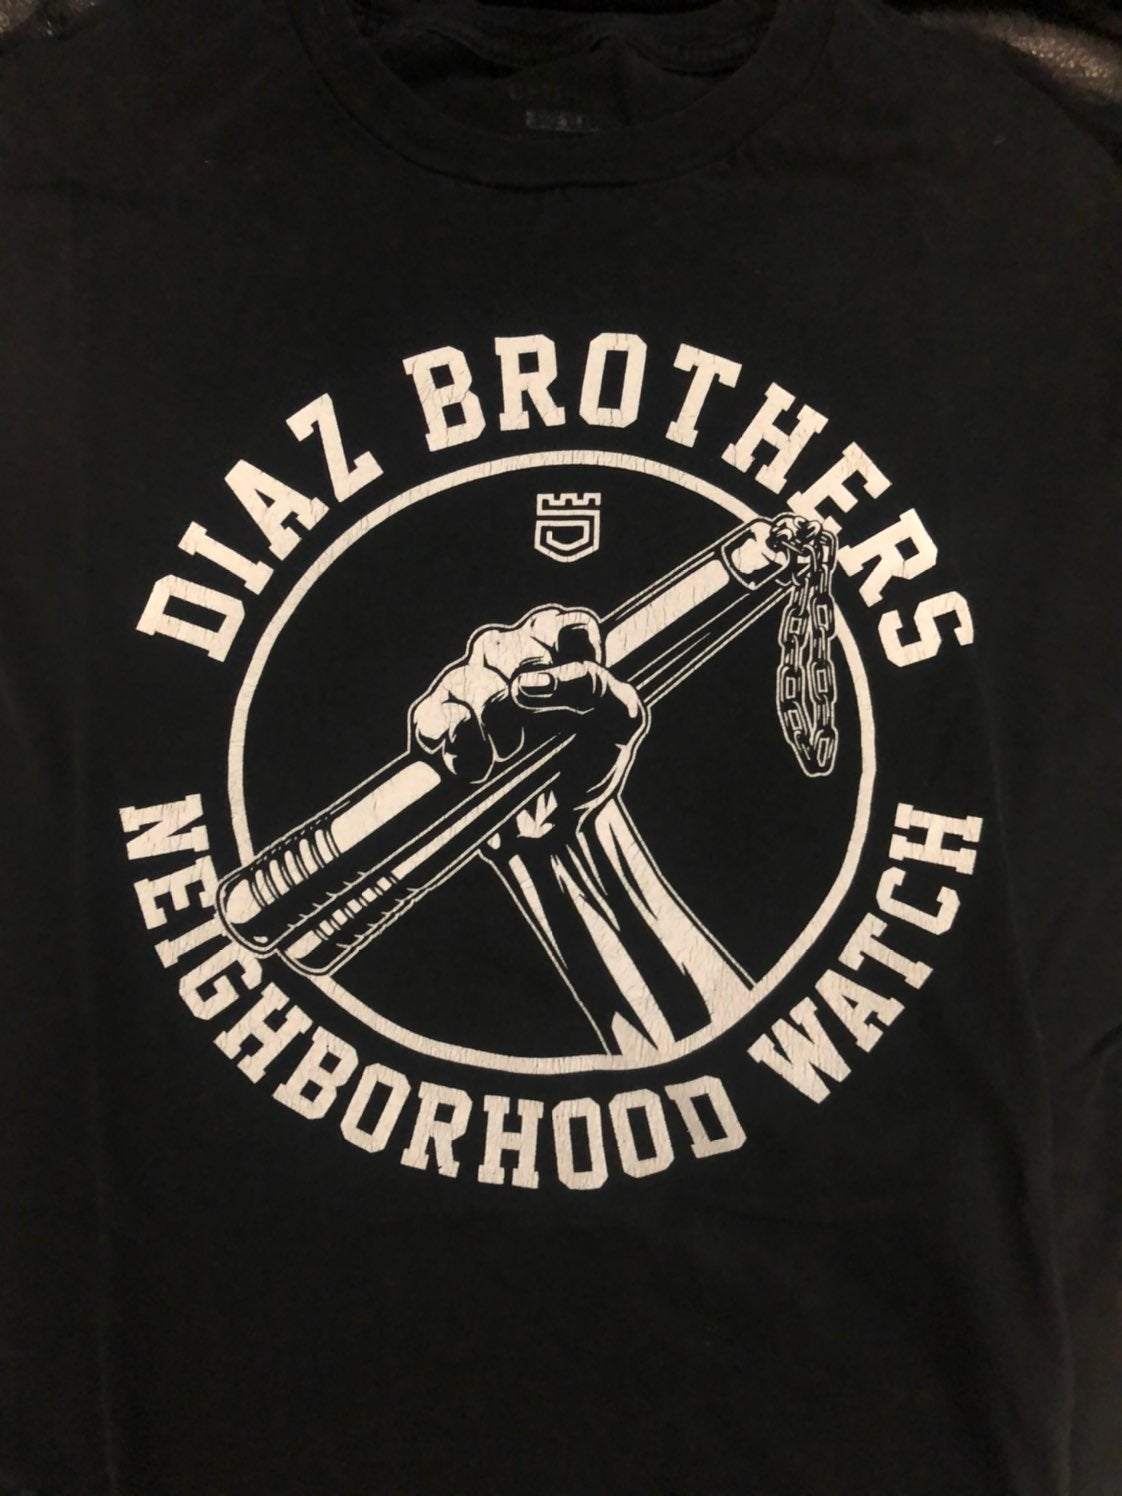 Dethrone Diaz Brothers Neighborhood Watc